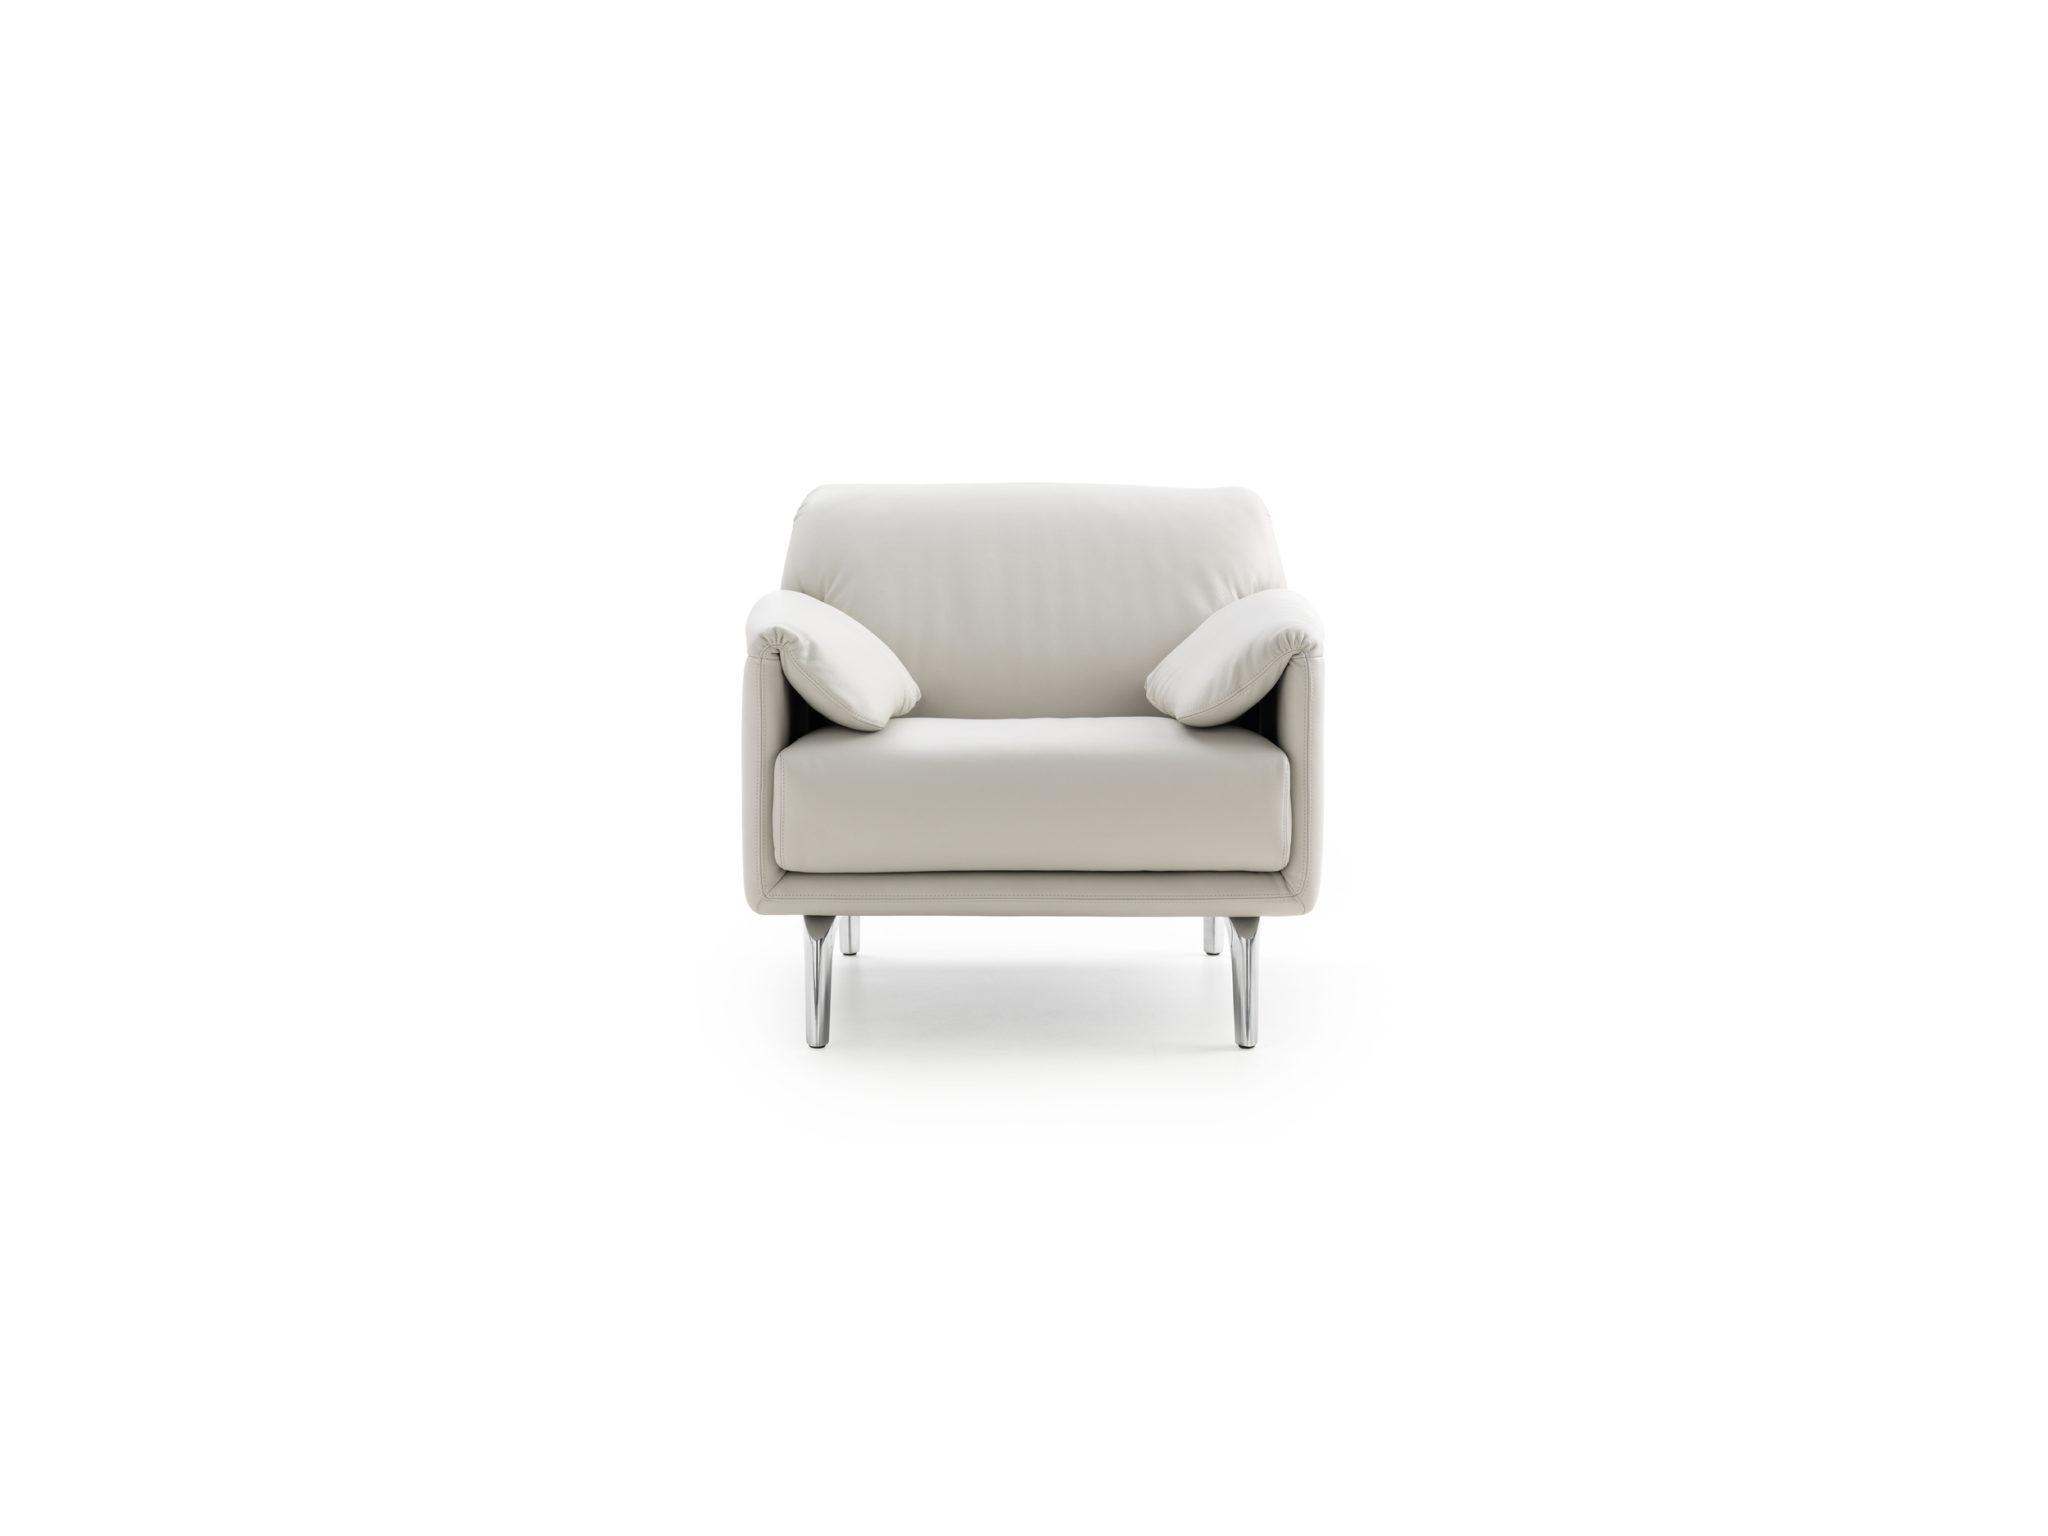 Leolux fauteuil Bora balanza pa